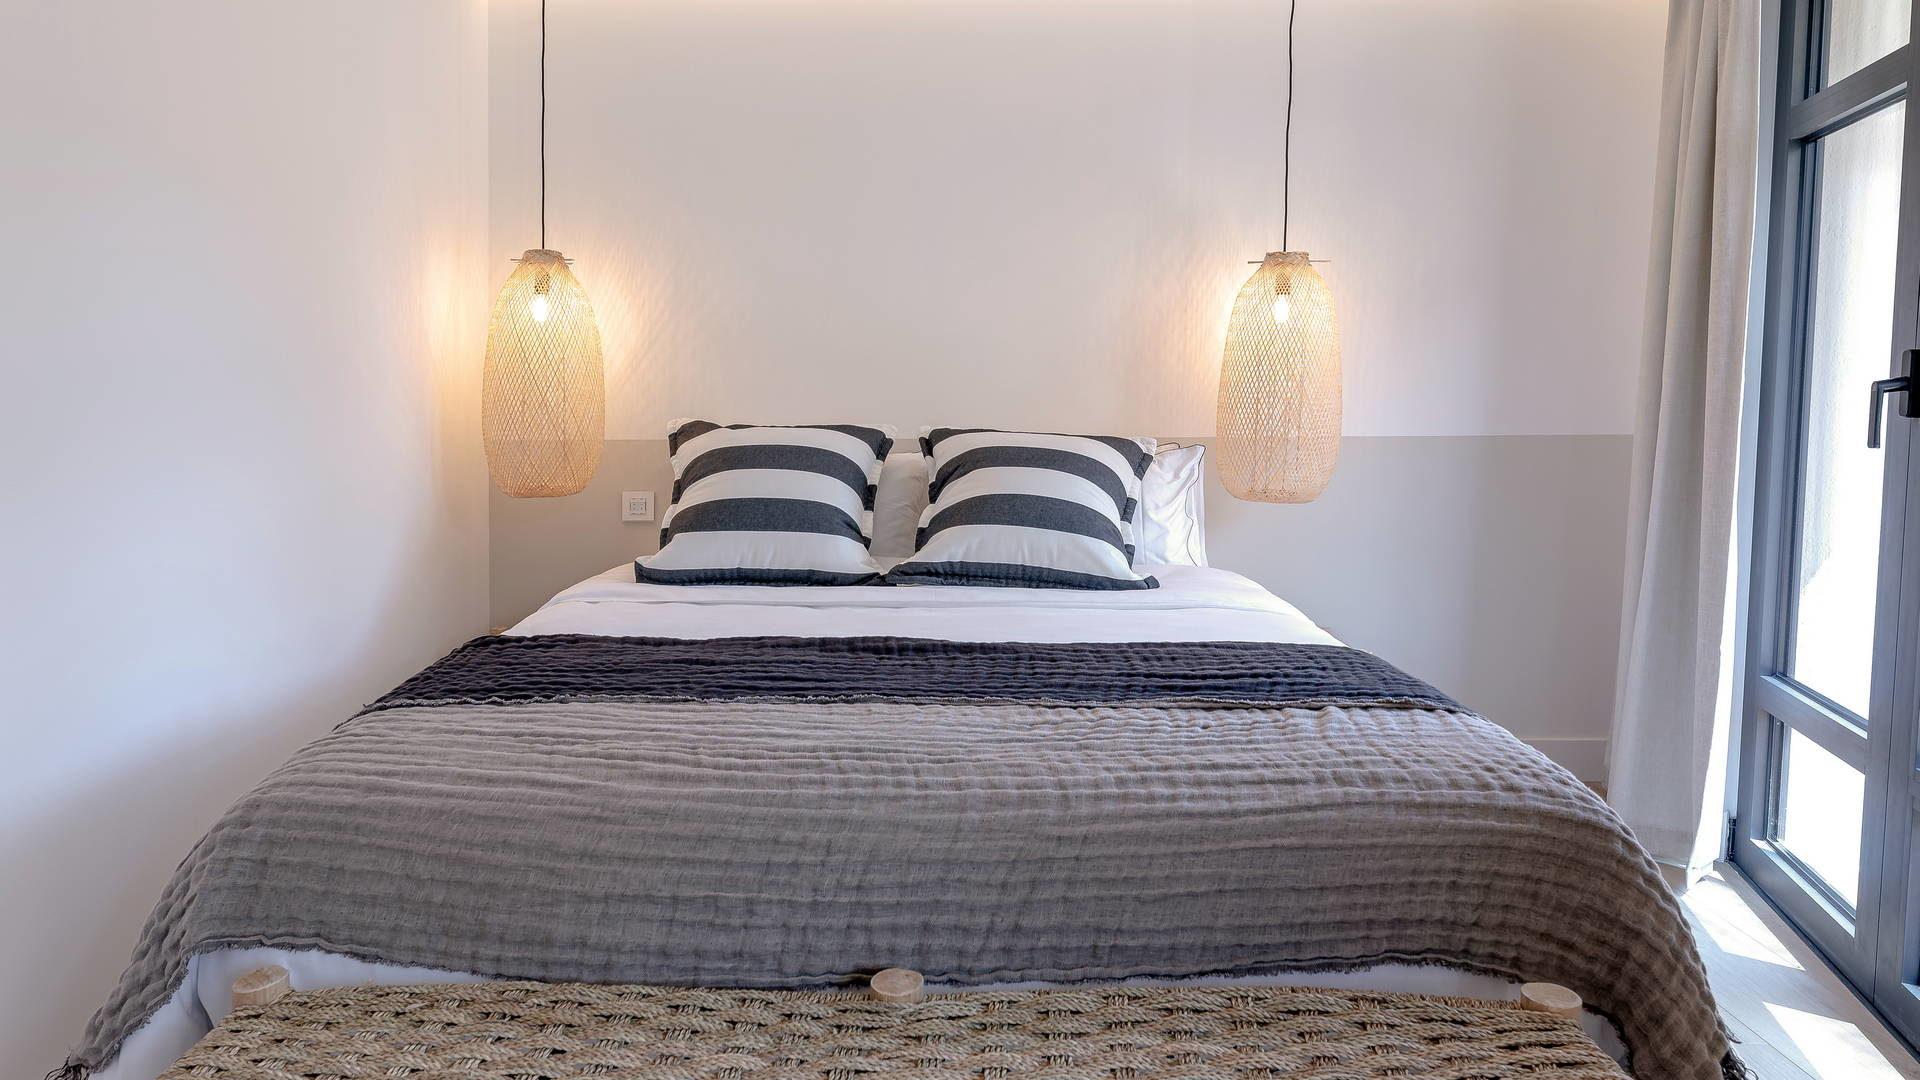 Chambre lumineuse hotel de charme banyuls